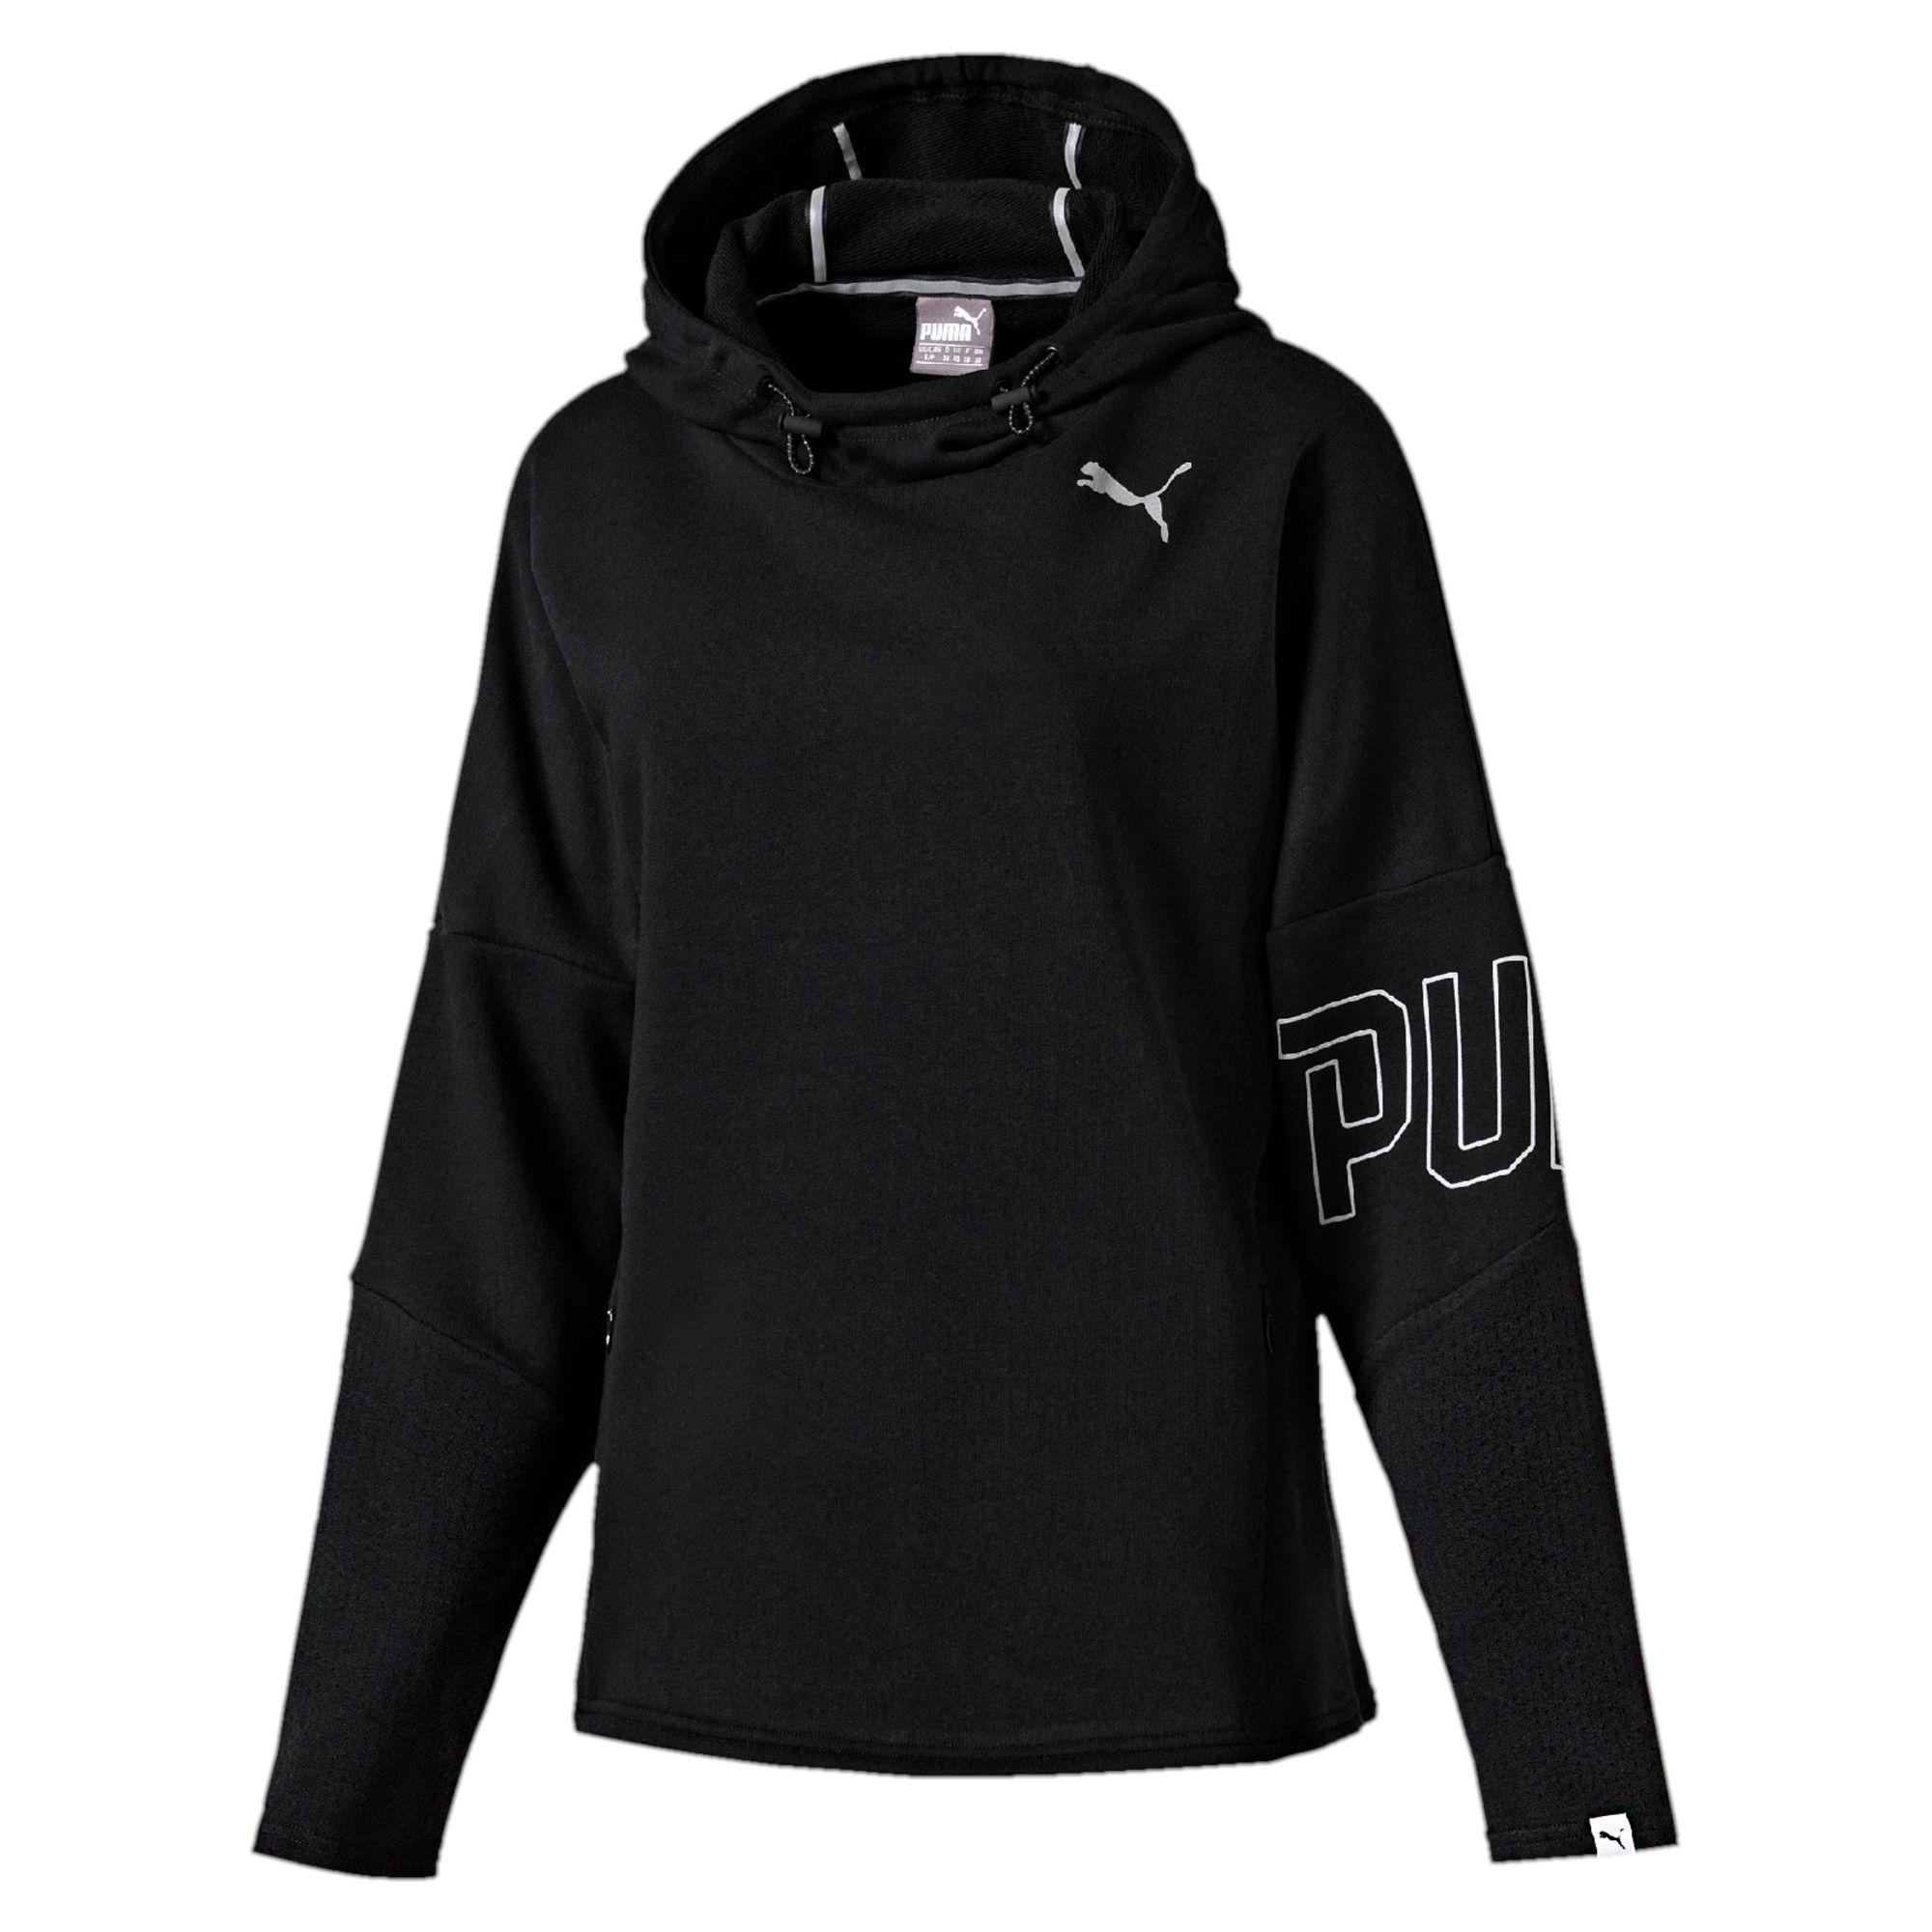 puma damen swagger hoodie frauen sweat basics neu ebay. Black Bedroom Furniture Sets. Home Design Ideas